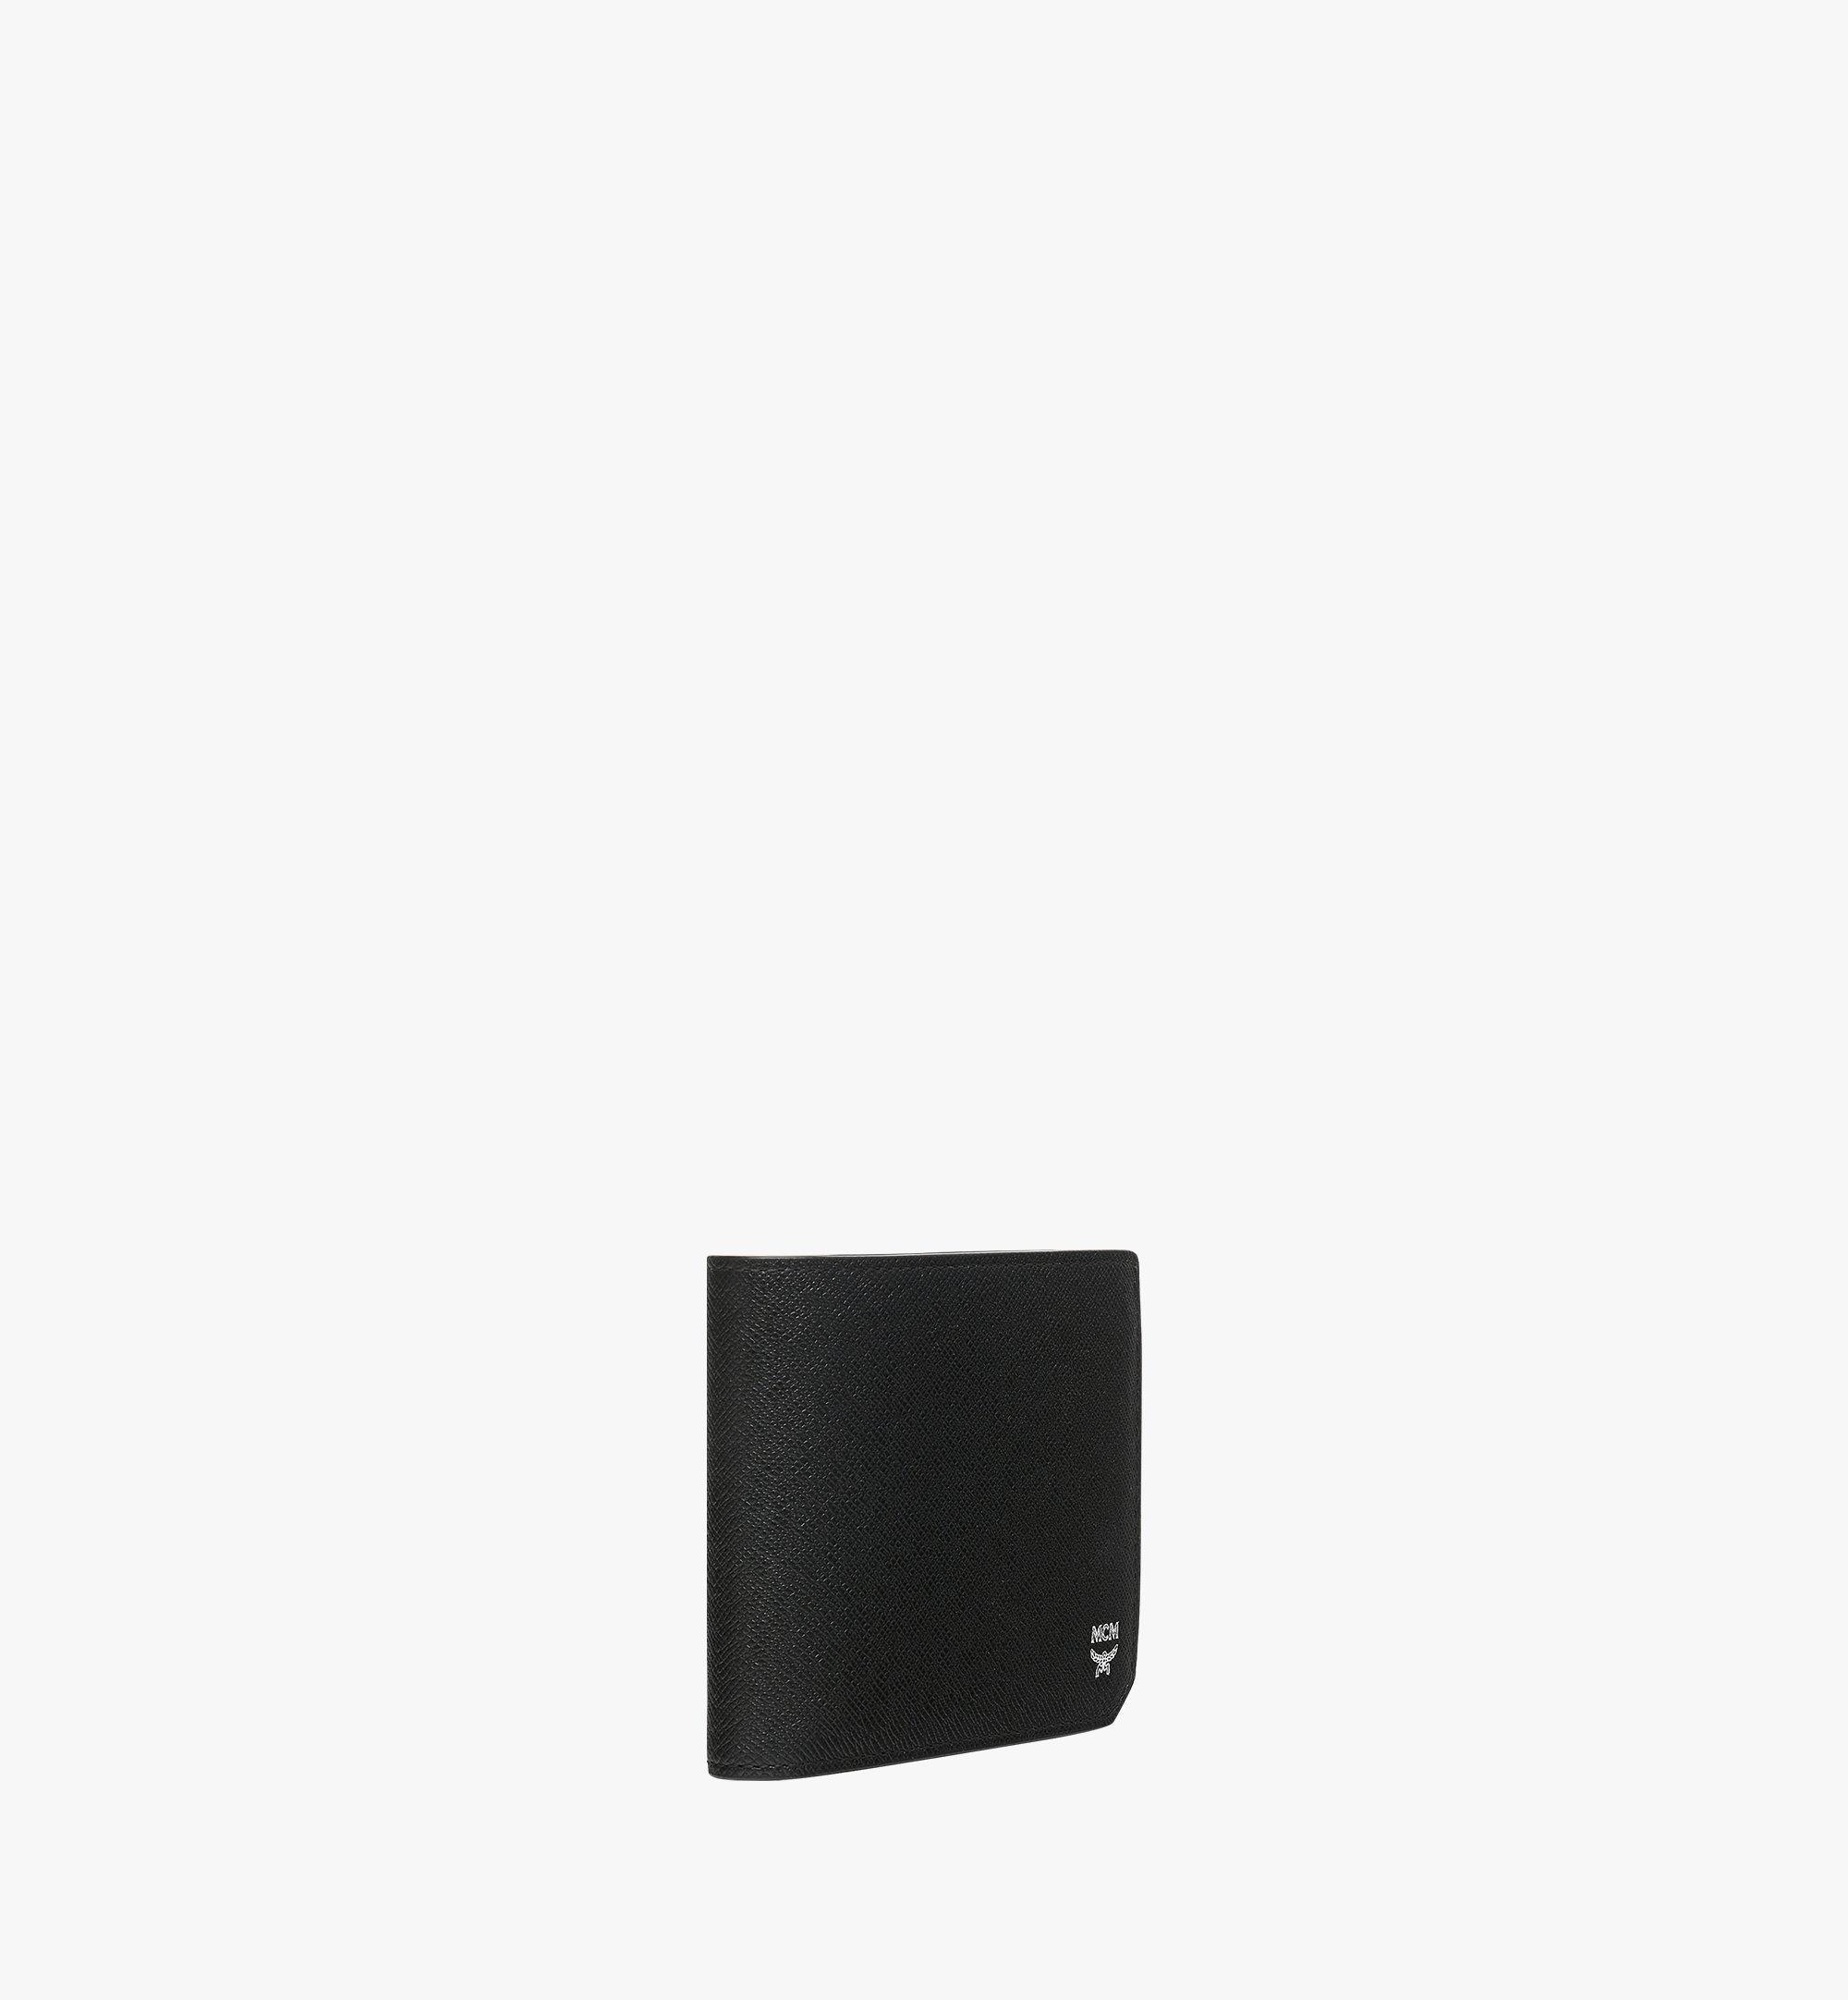 MCM 뉴브릭 엠보싱 레더 카드케이스 2단 지갑 Black MXS8ALL52BK001 Alternate View 2